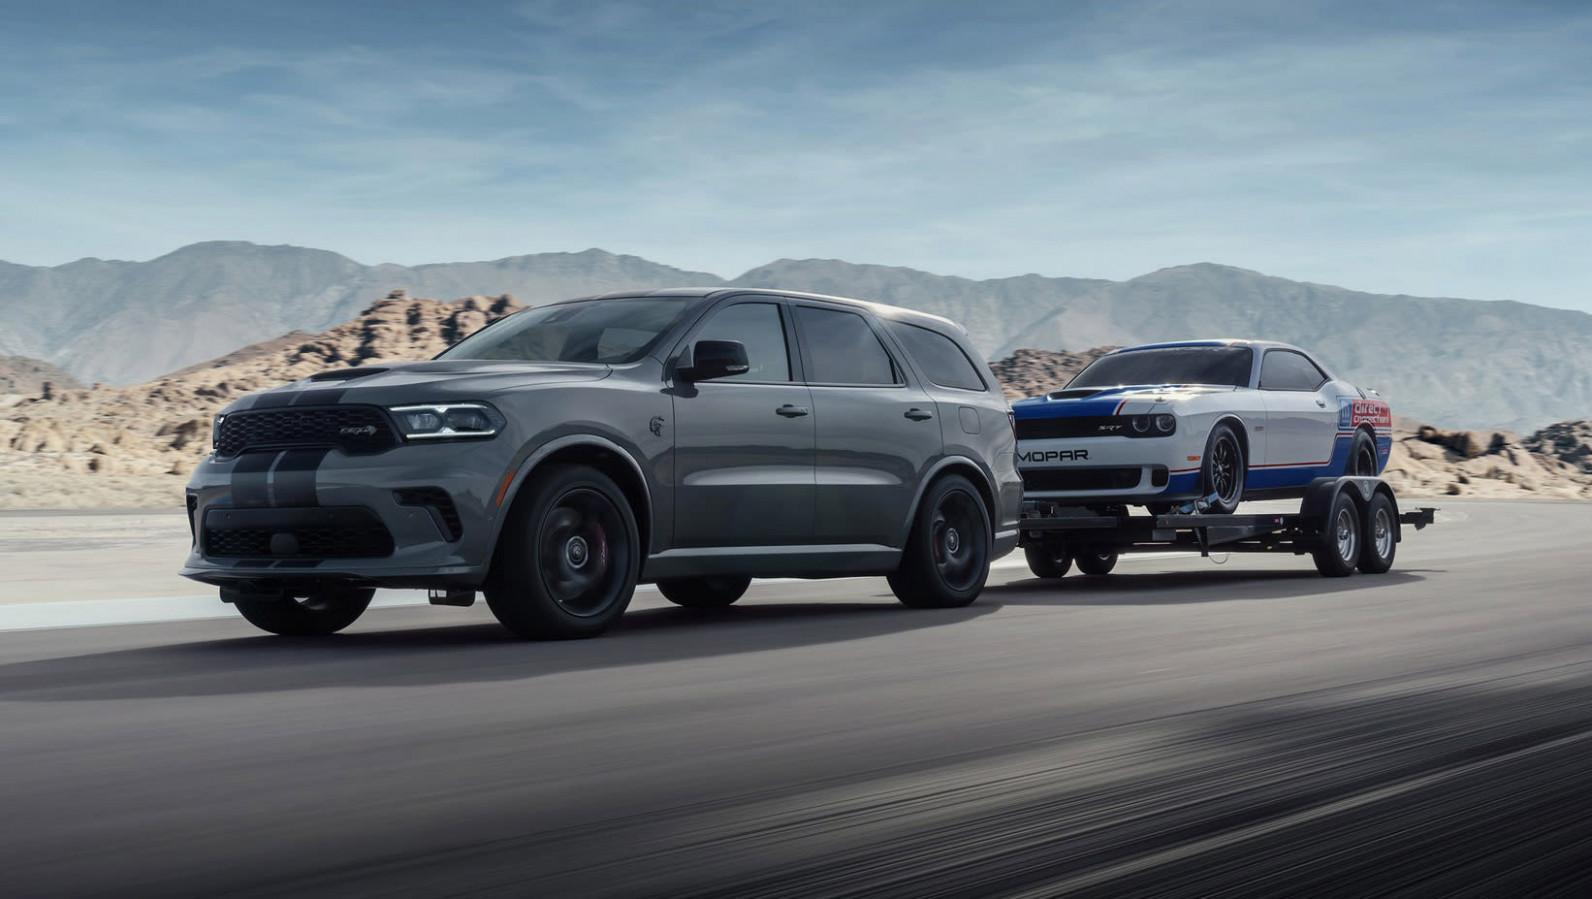 Rumors Dodge Supercharger 2022